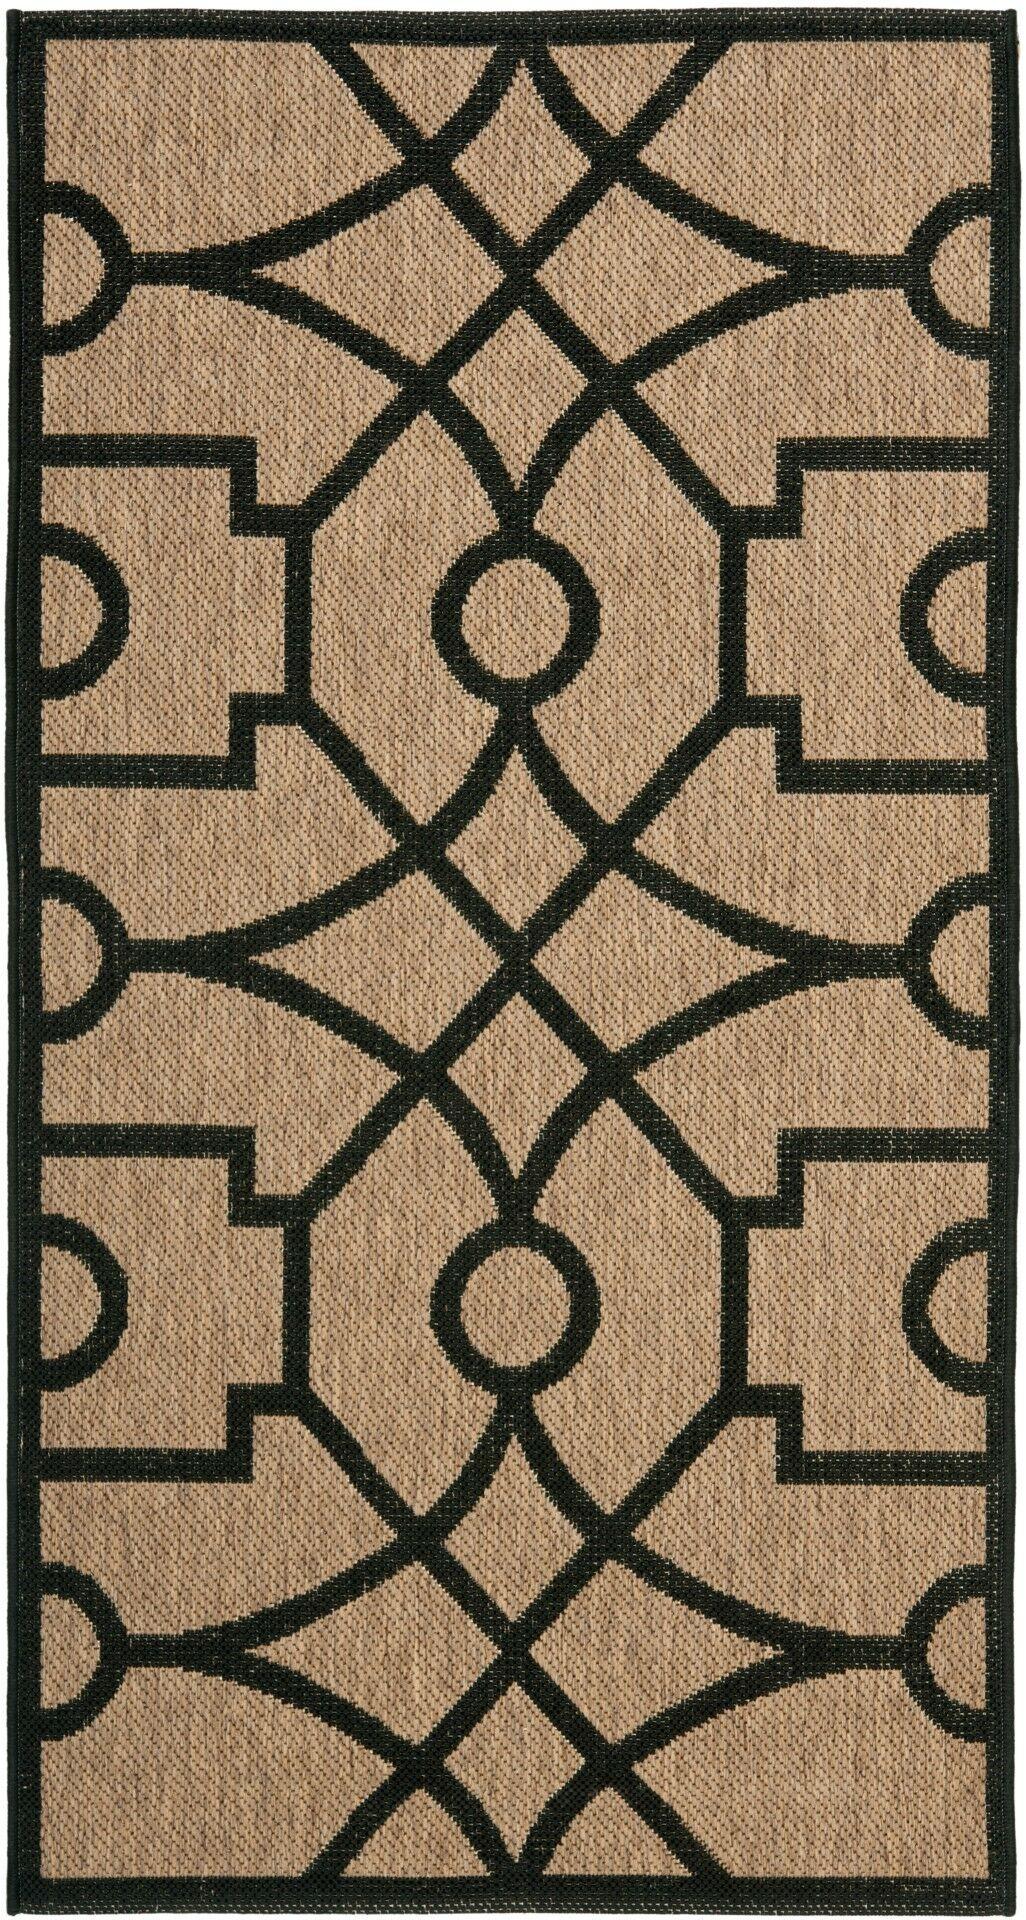 Martha Stewart Fretwork Tan/Black Area Rug Rug Size: Rectangle 6'7